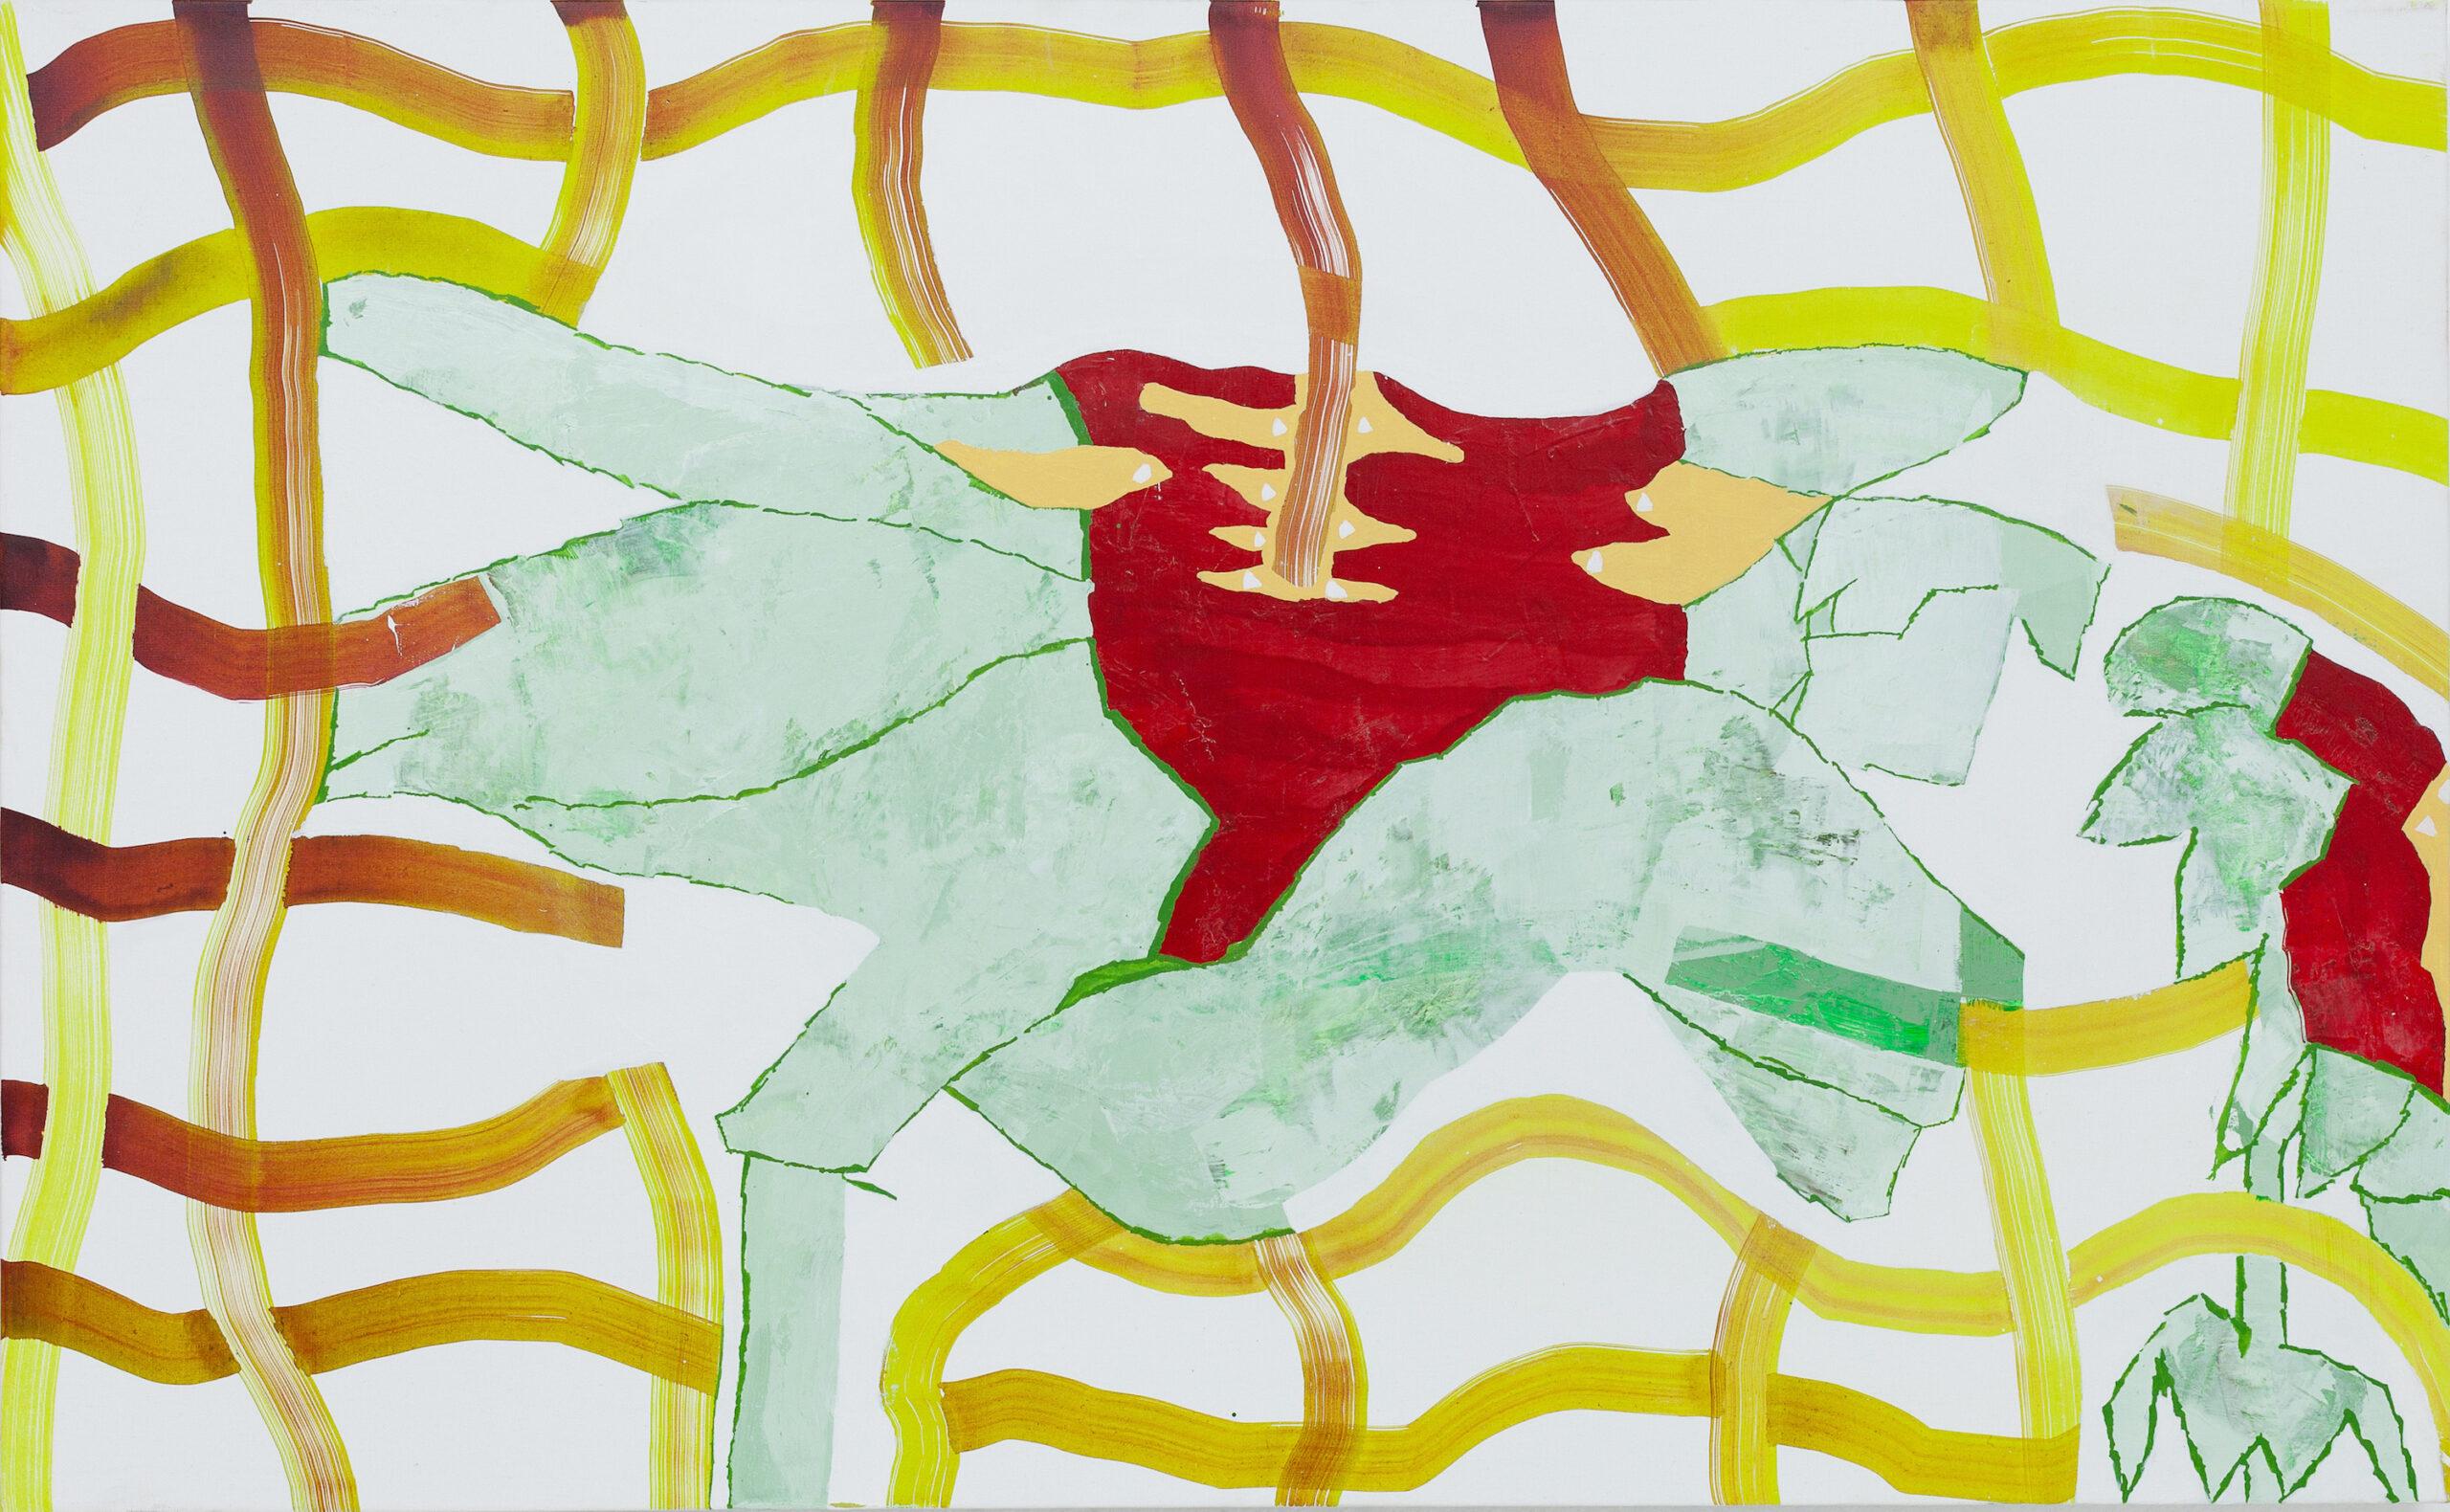 Elisabeth Condon, Pierced Red Flower, 2020